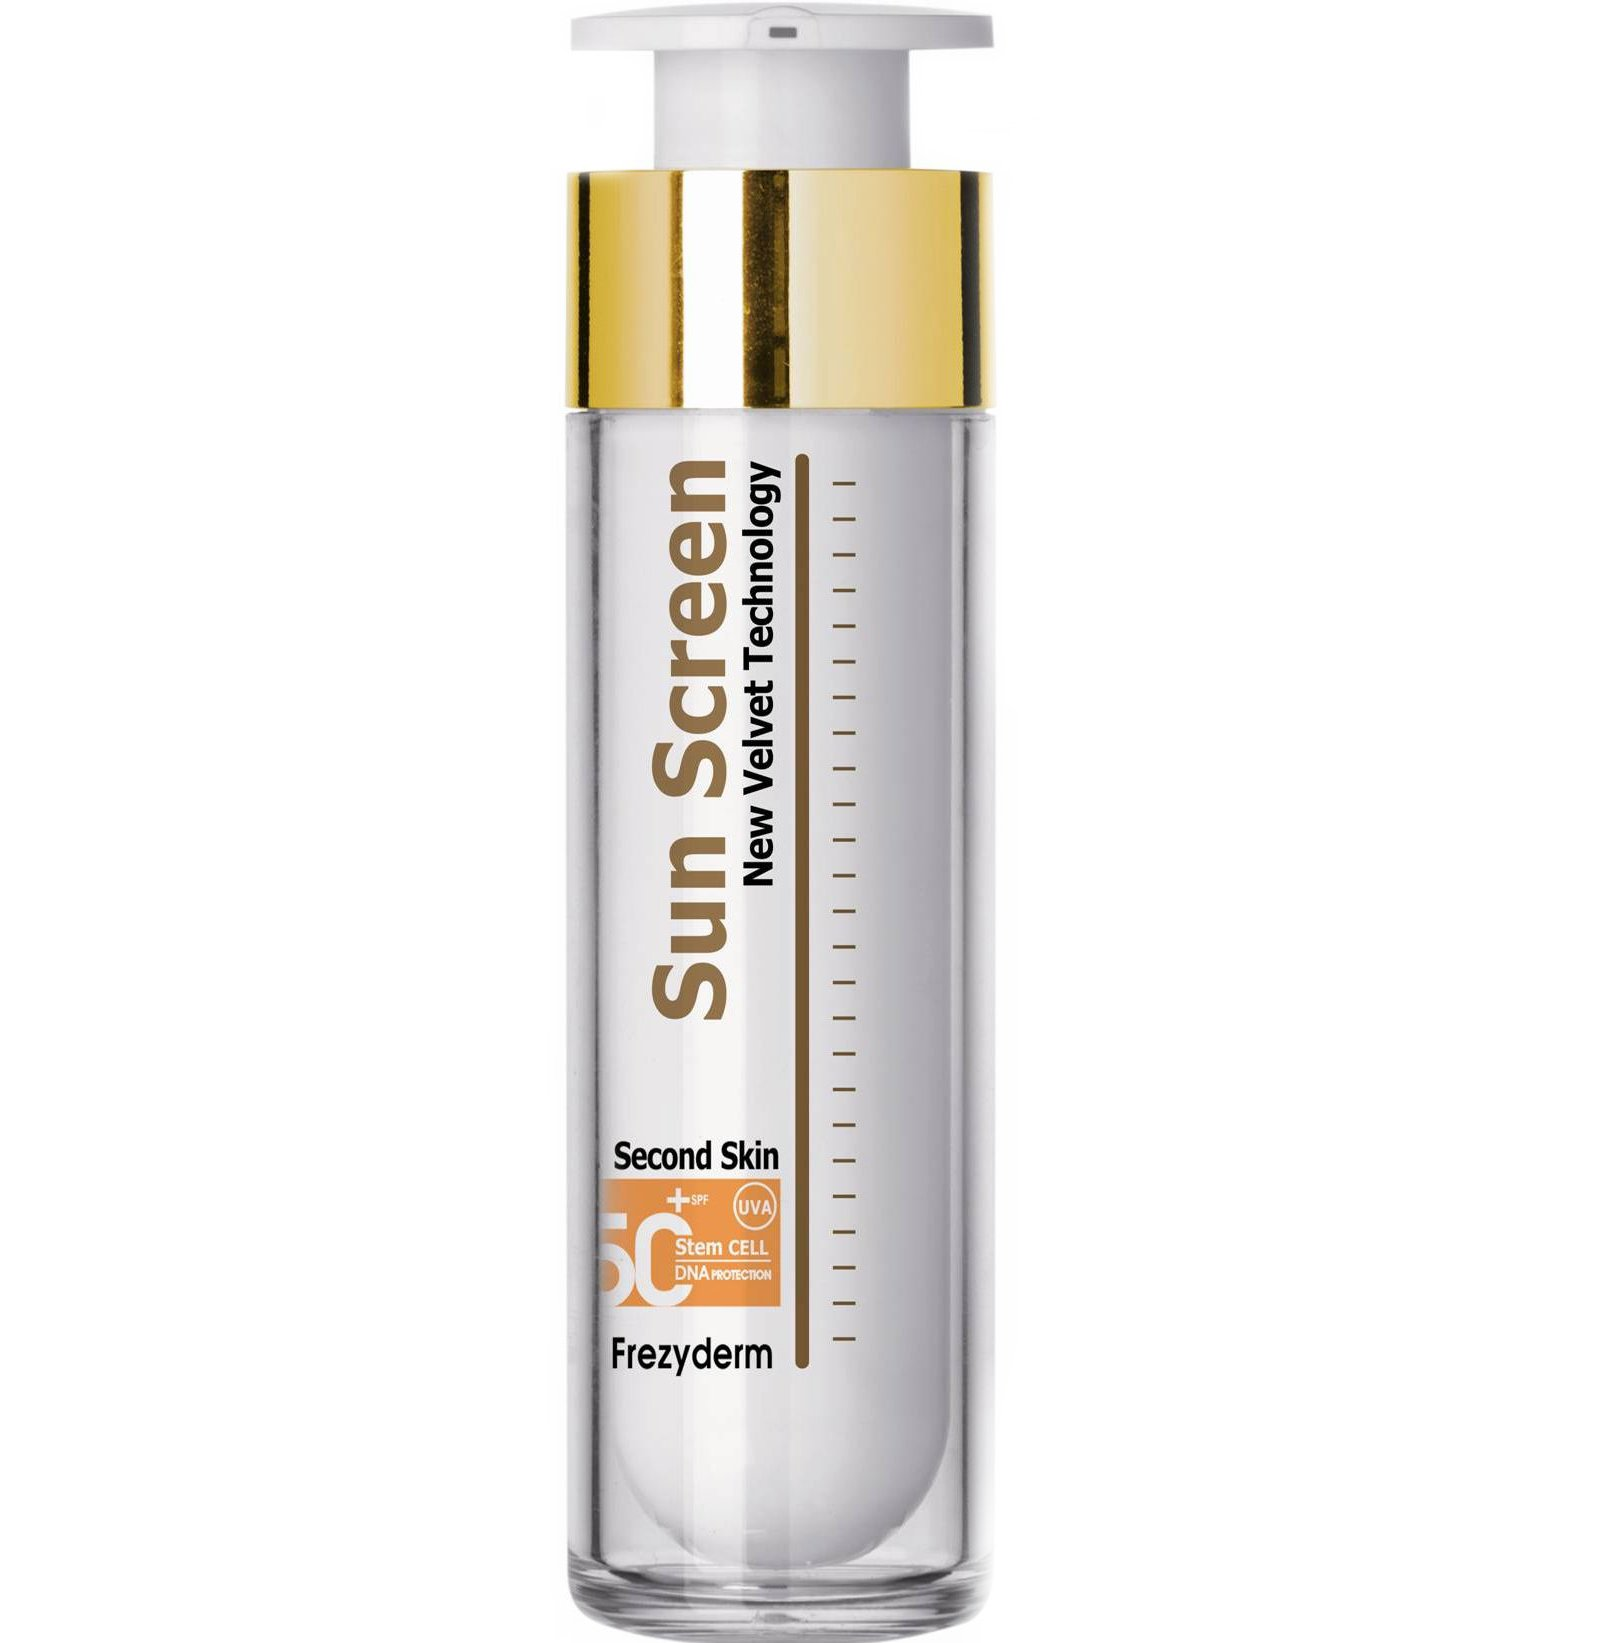 Frezyderm Sun Screen Velvet Face Cream Spf50+Διάφανη Αντηλιακή Προσώπου Βελούδινης Υφής, Πολύ Υψηλής Προστασίας 50ml